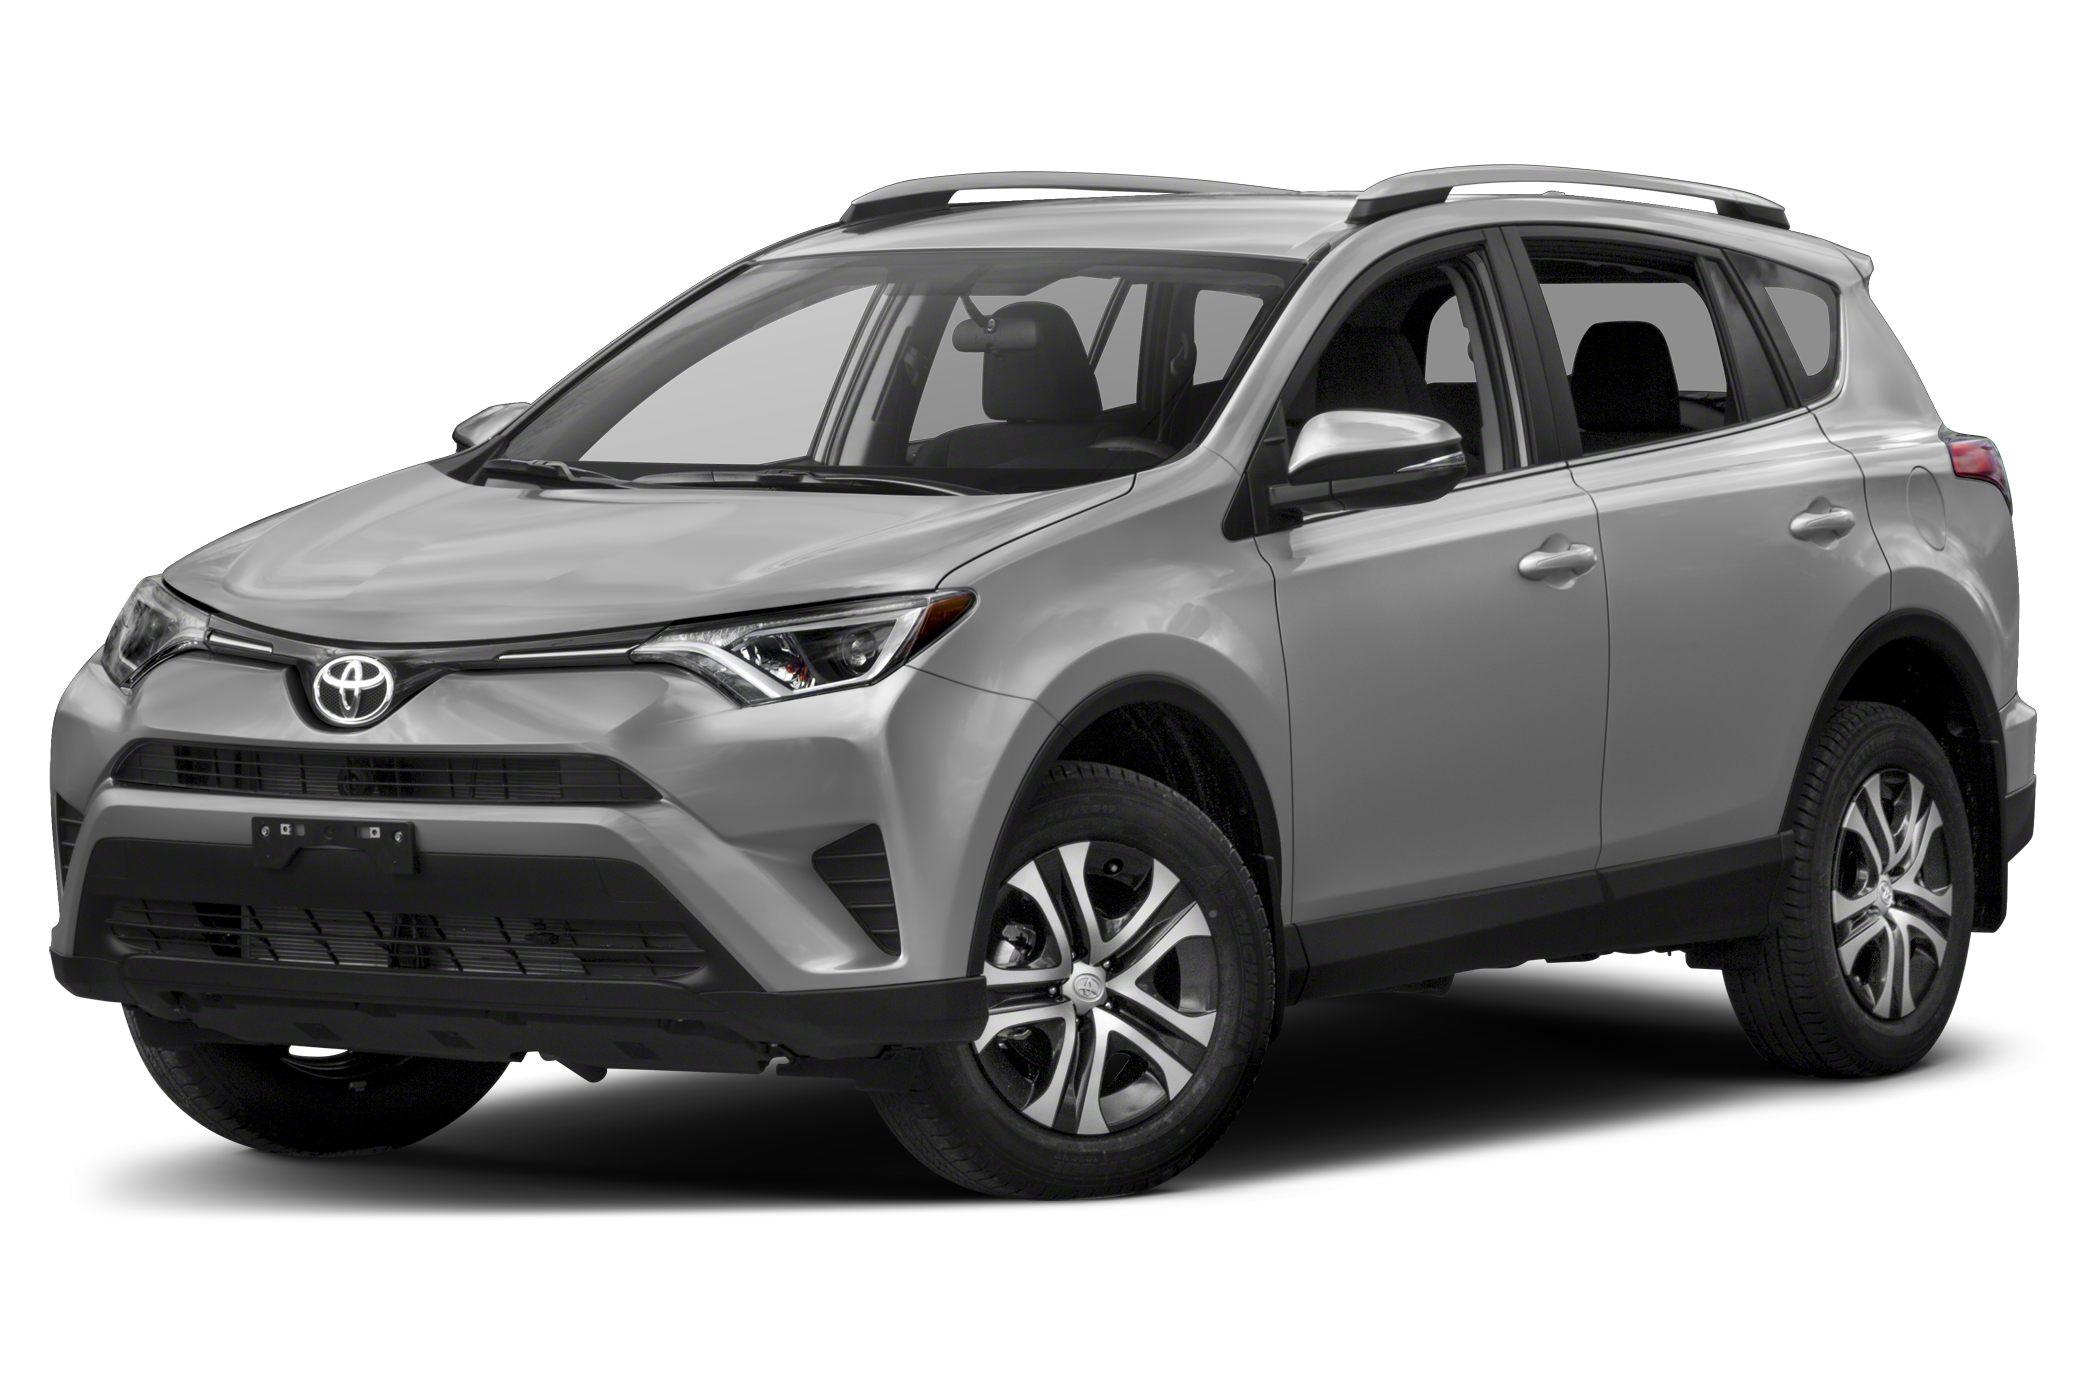 Rav4 Lease Deals >> 2018 Toyota Rav4 Styles Features Highlights